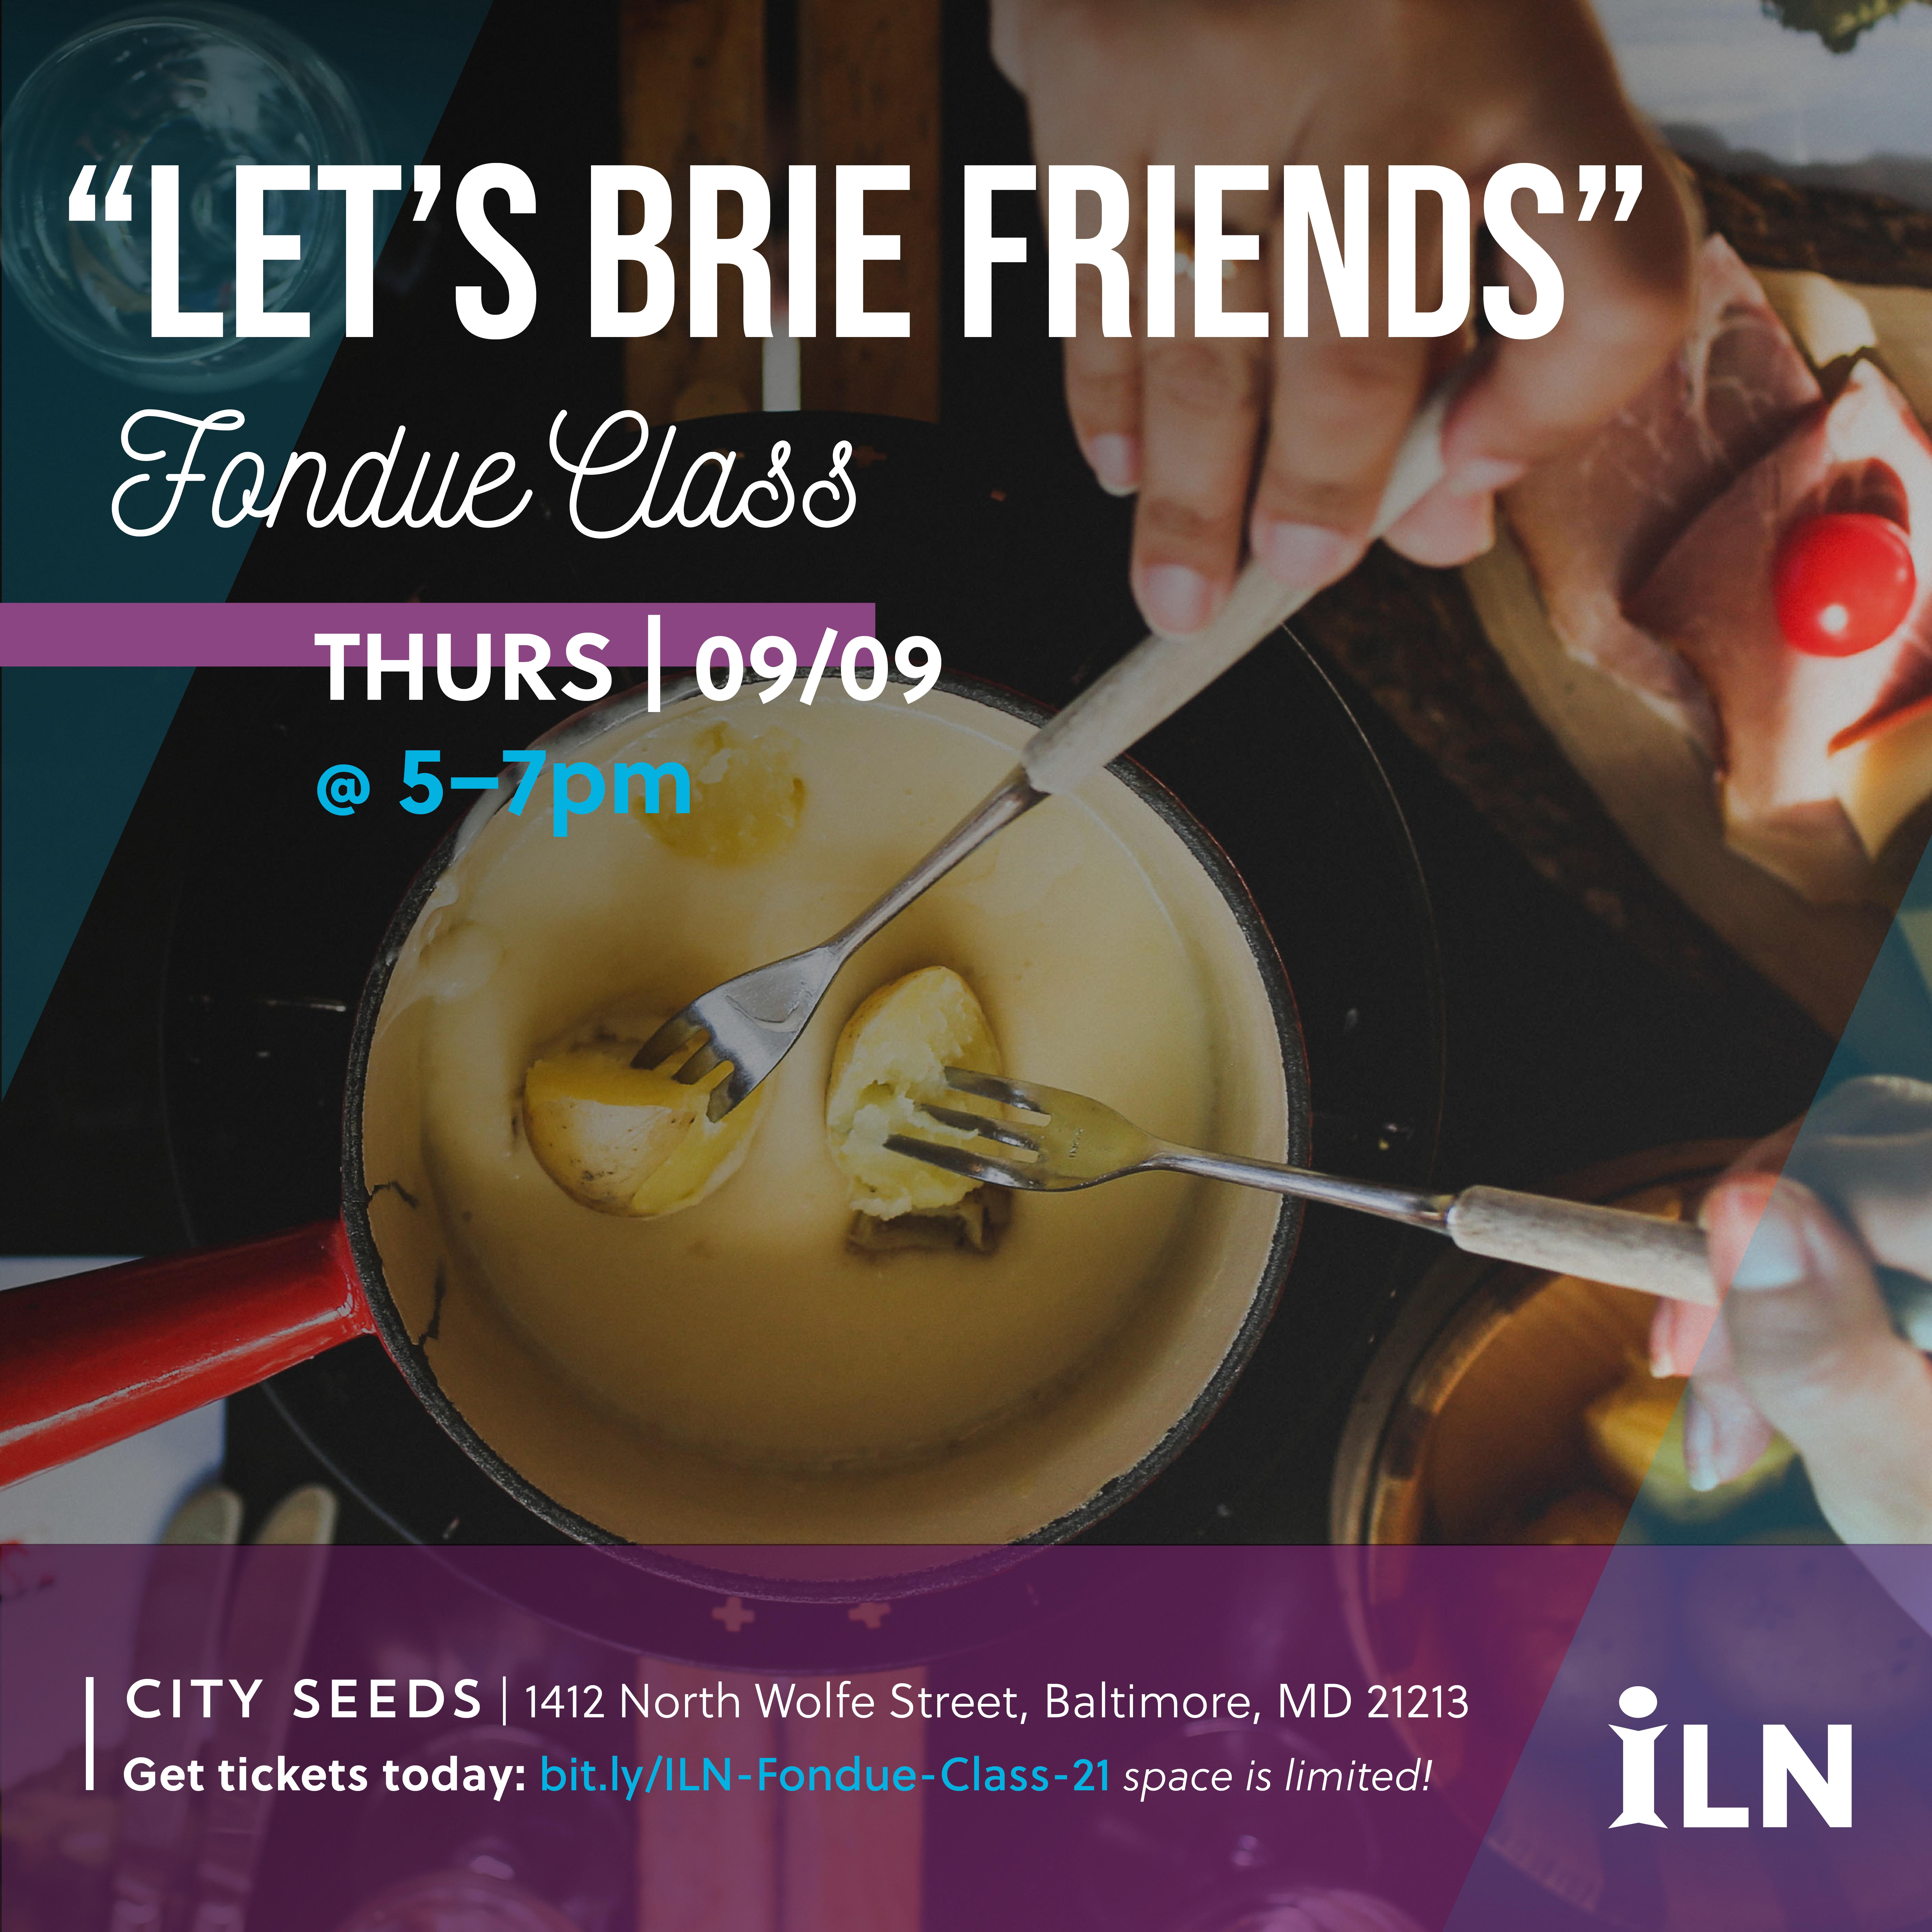 Impact Leaders Network Event – Let's Brie Friends Fondue Class